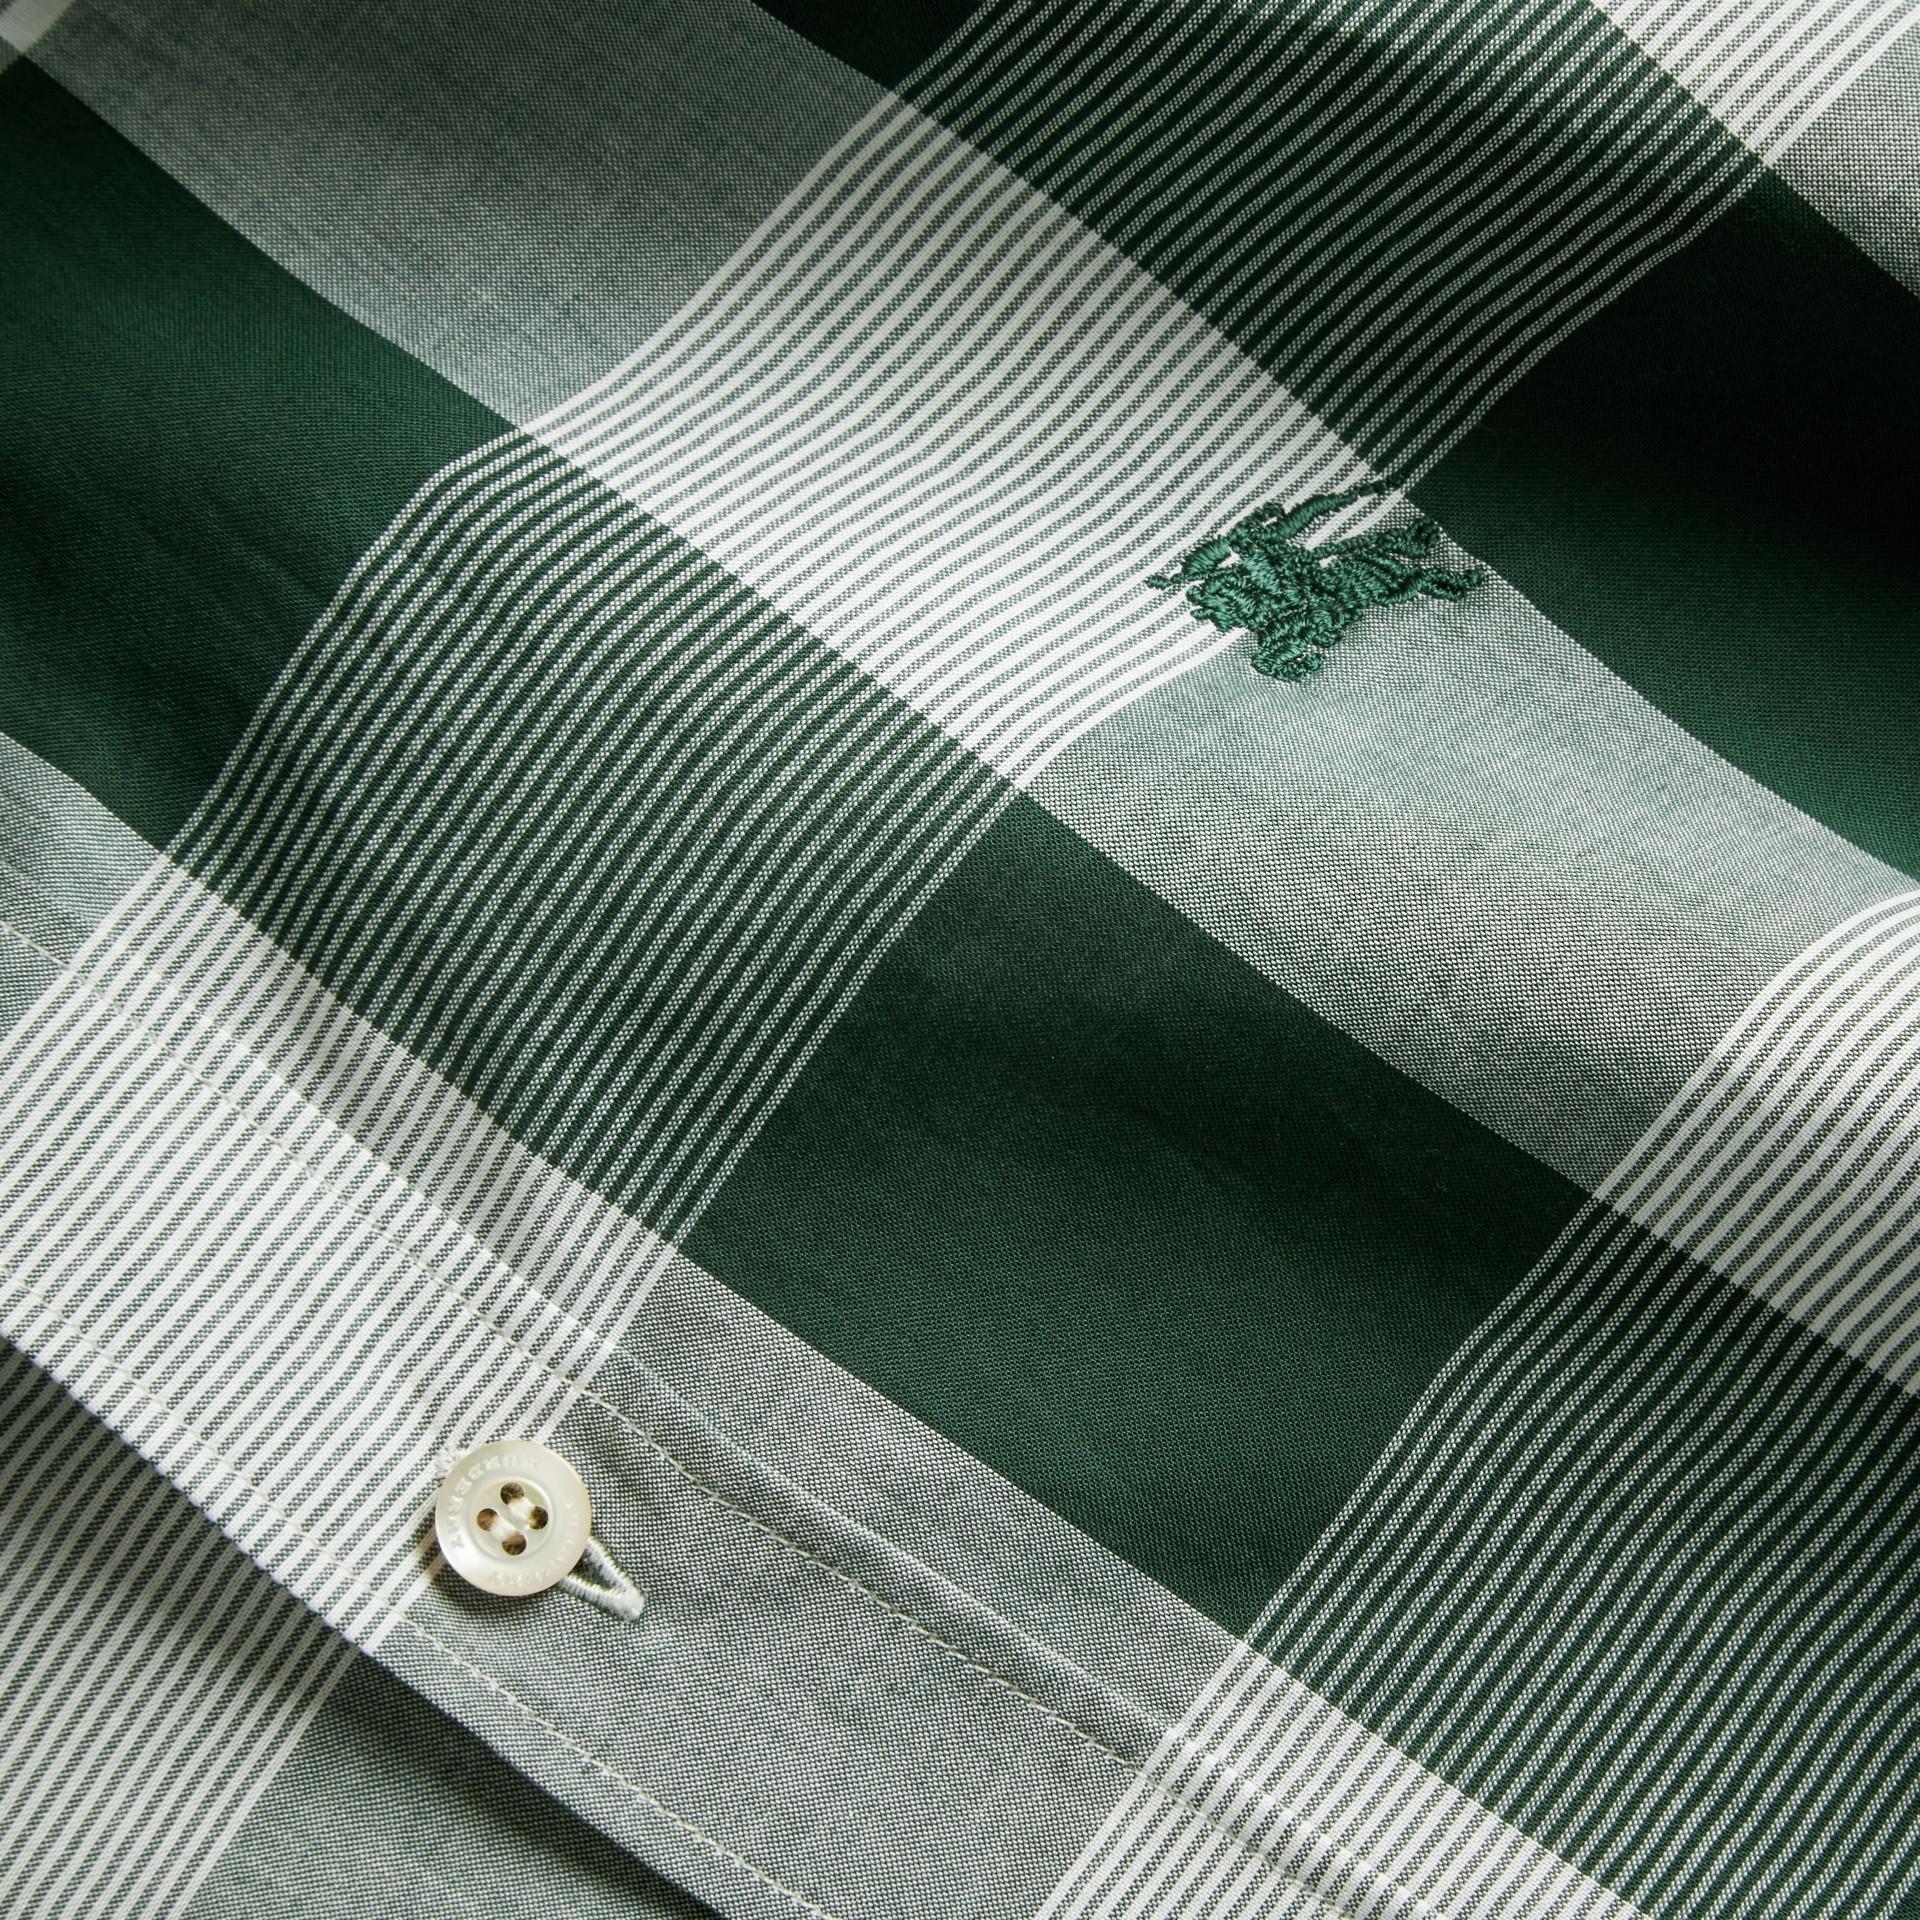 Short-sleeved Tonal Check Cotton Shirt Dark Bottle Green - gallery image 2